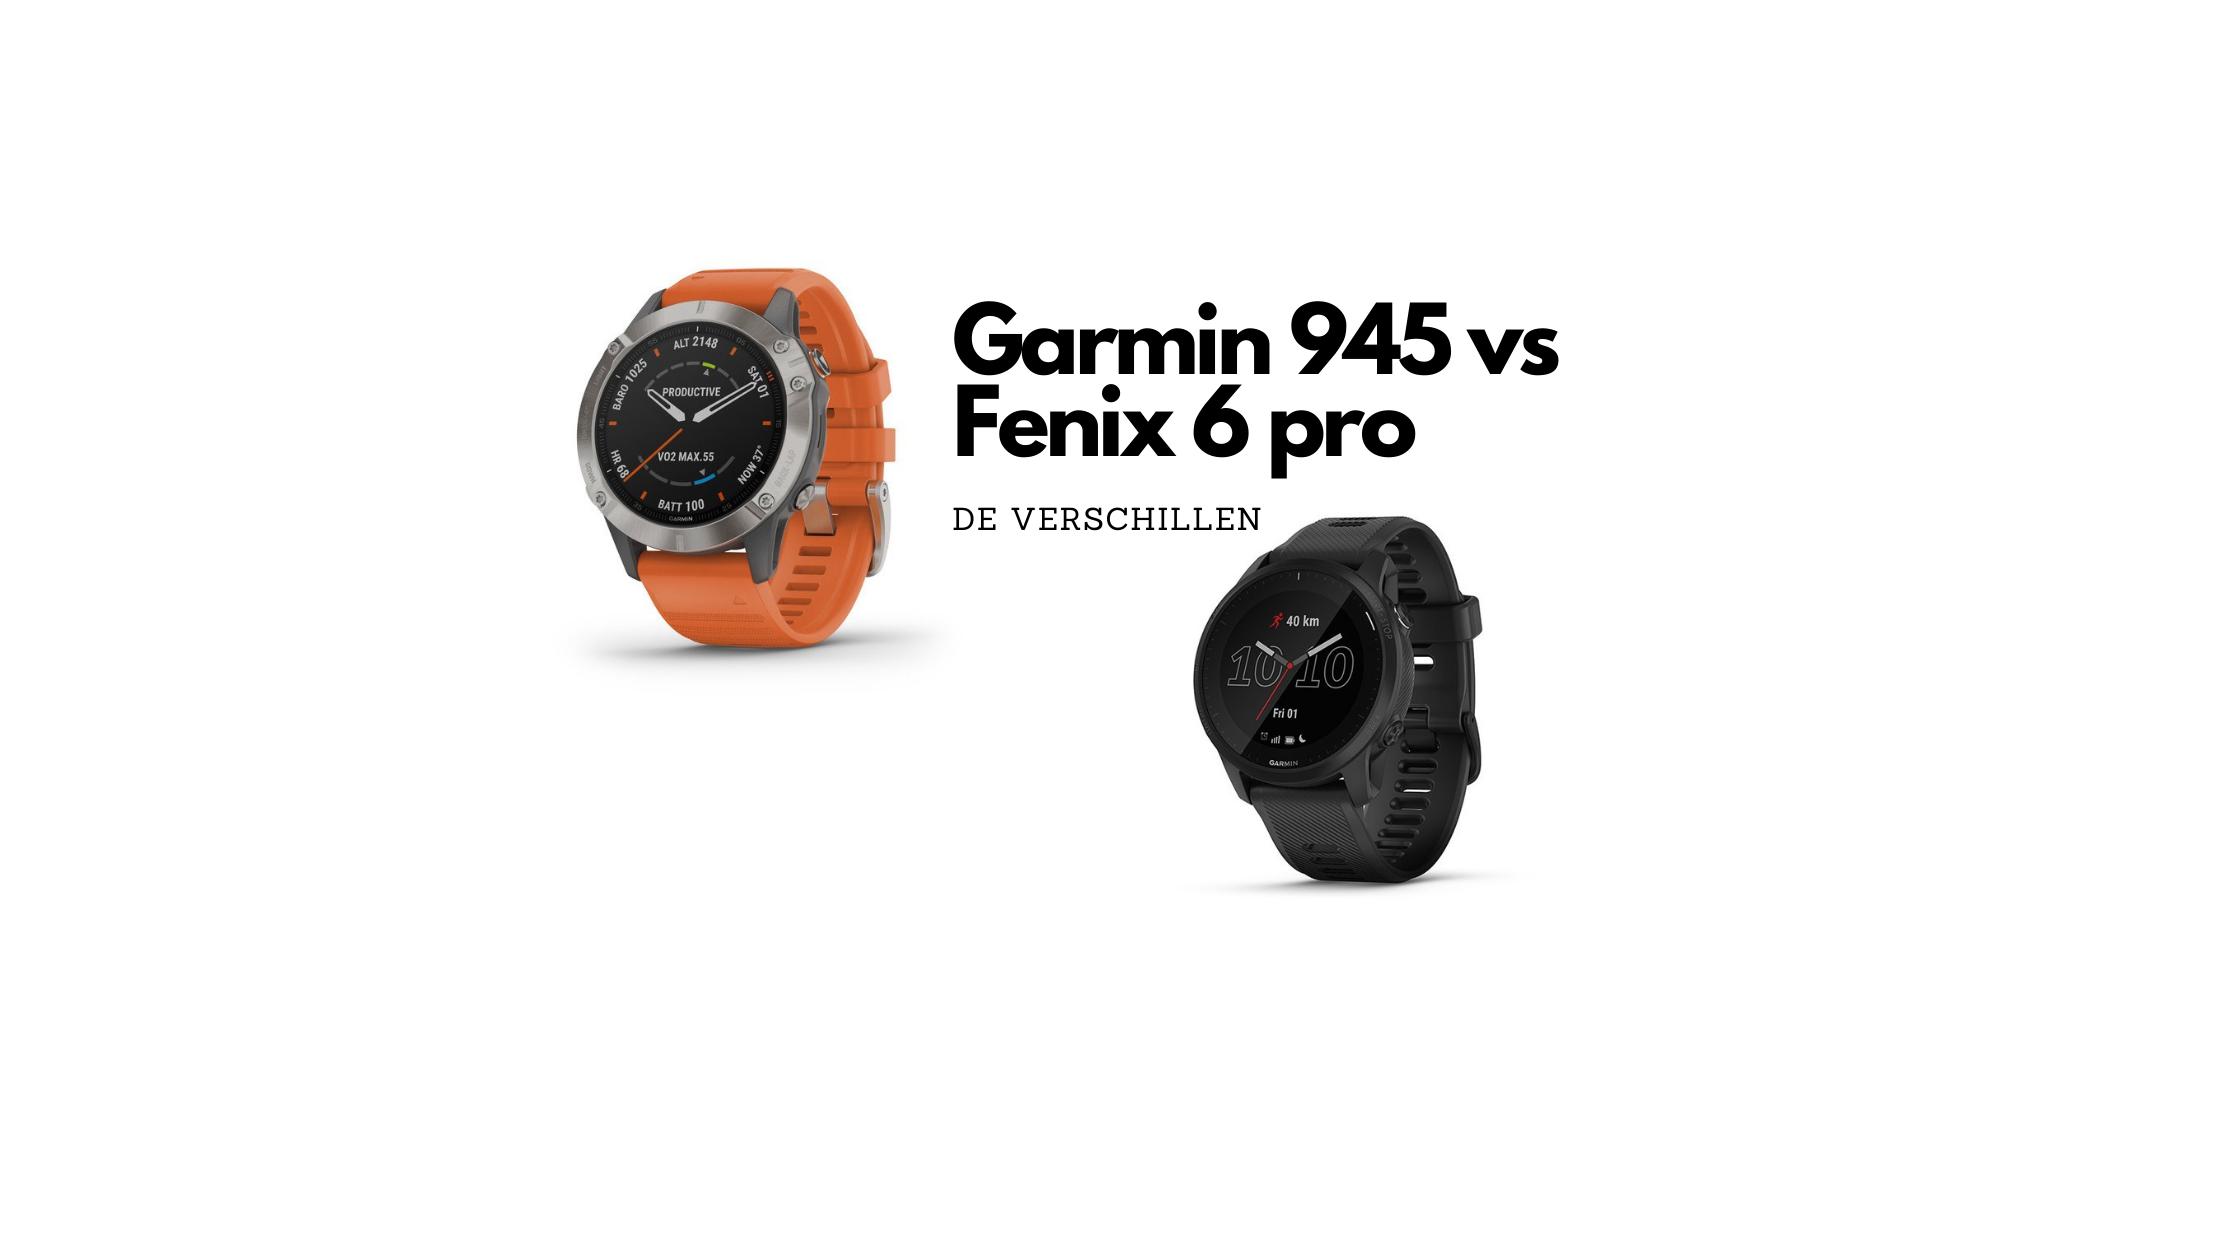 Garmin 945 vs Fenix 6 pro